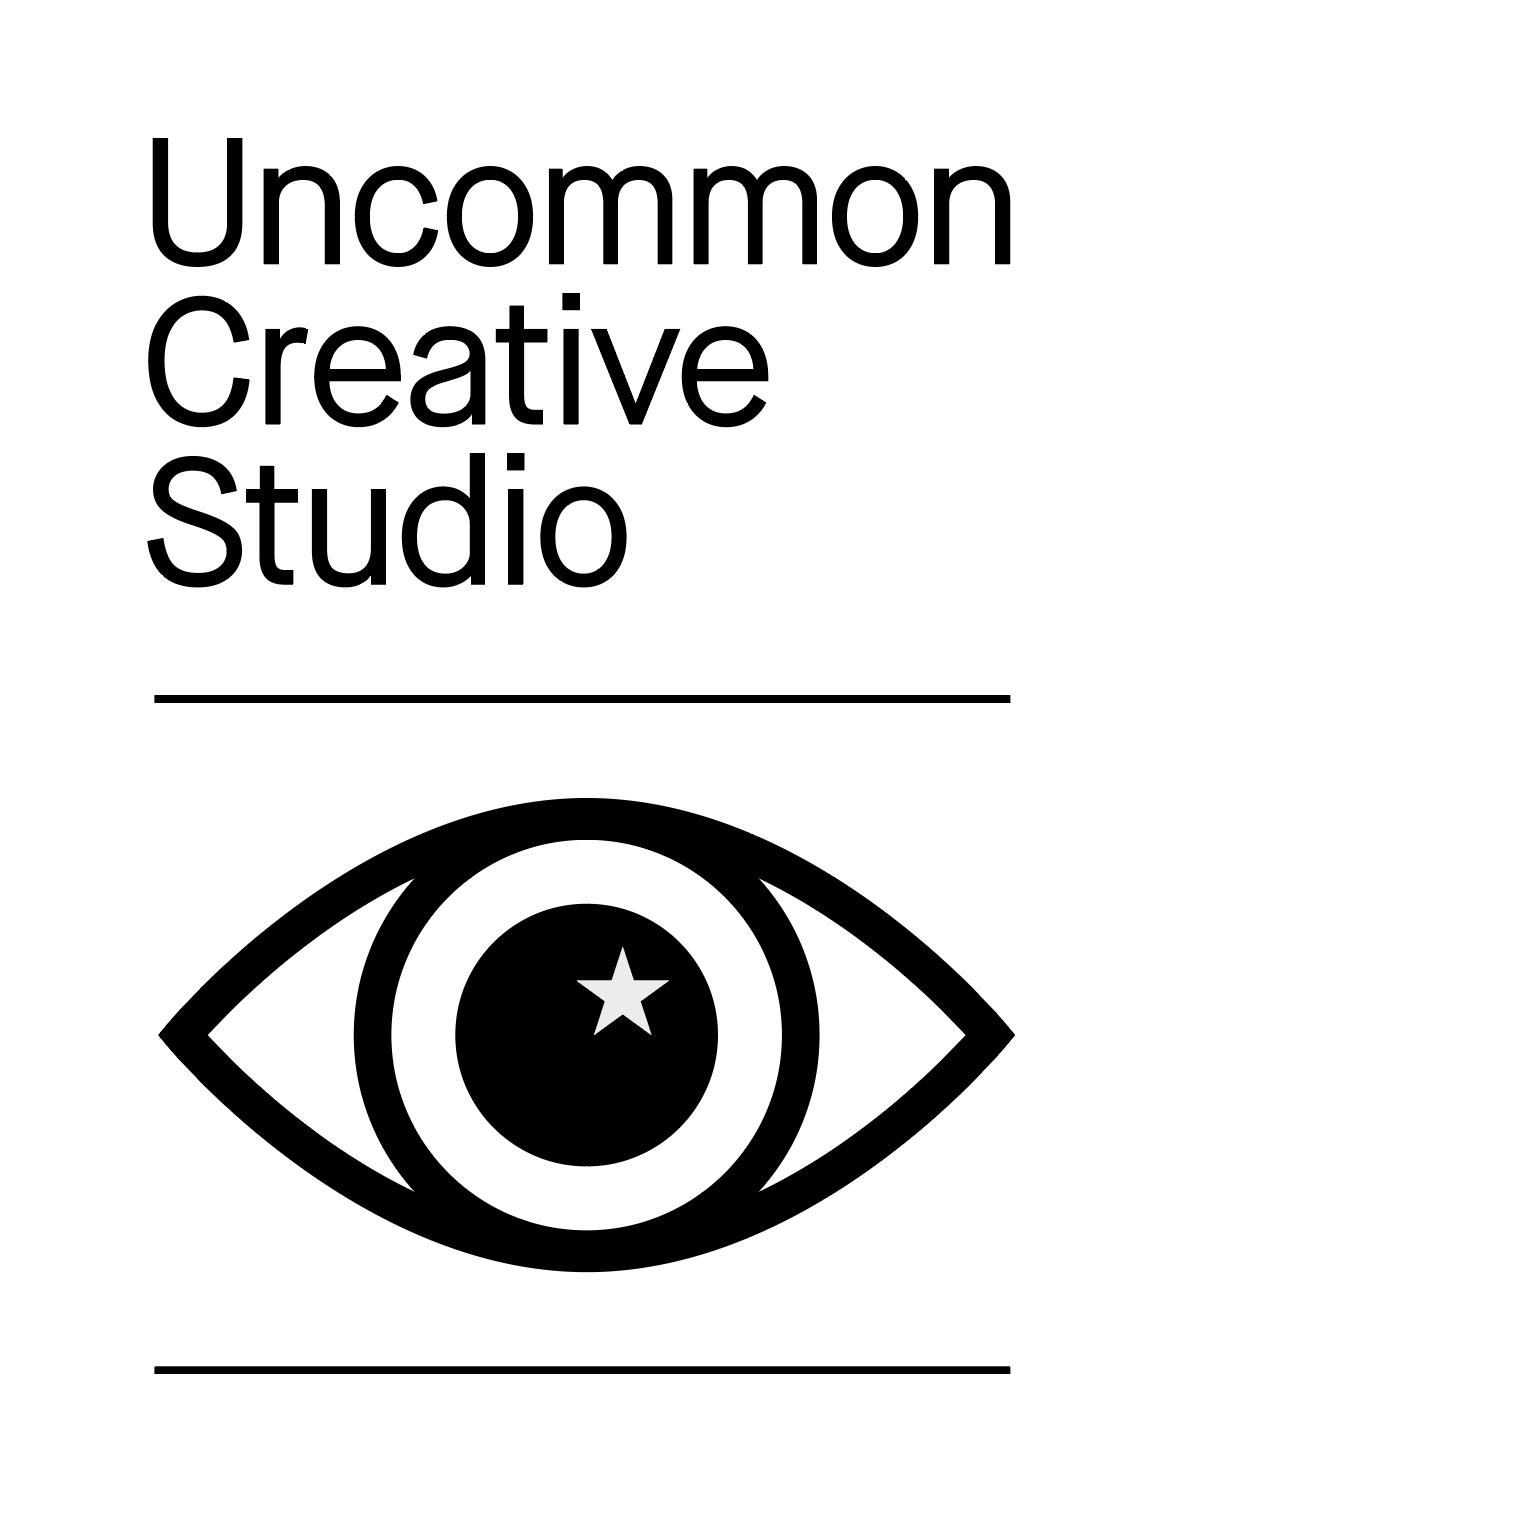 Uncommon creative studio logo 3.png